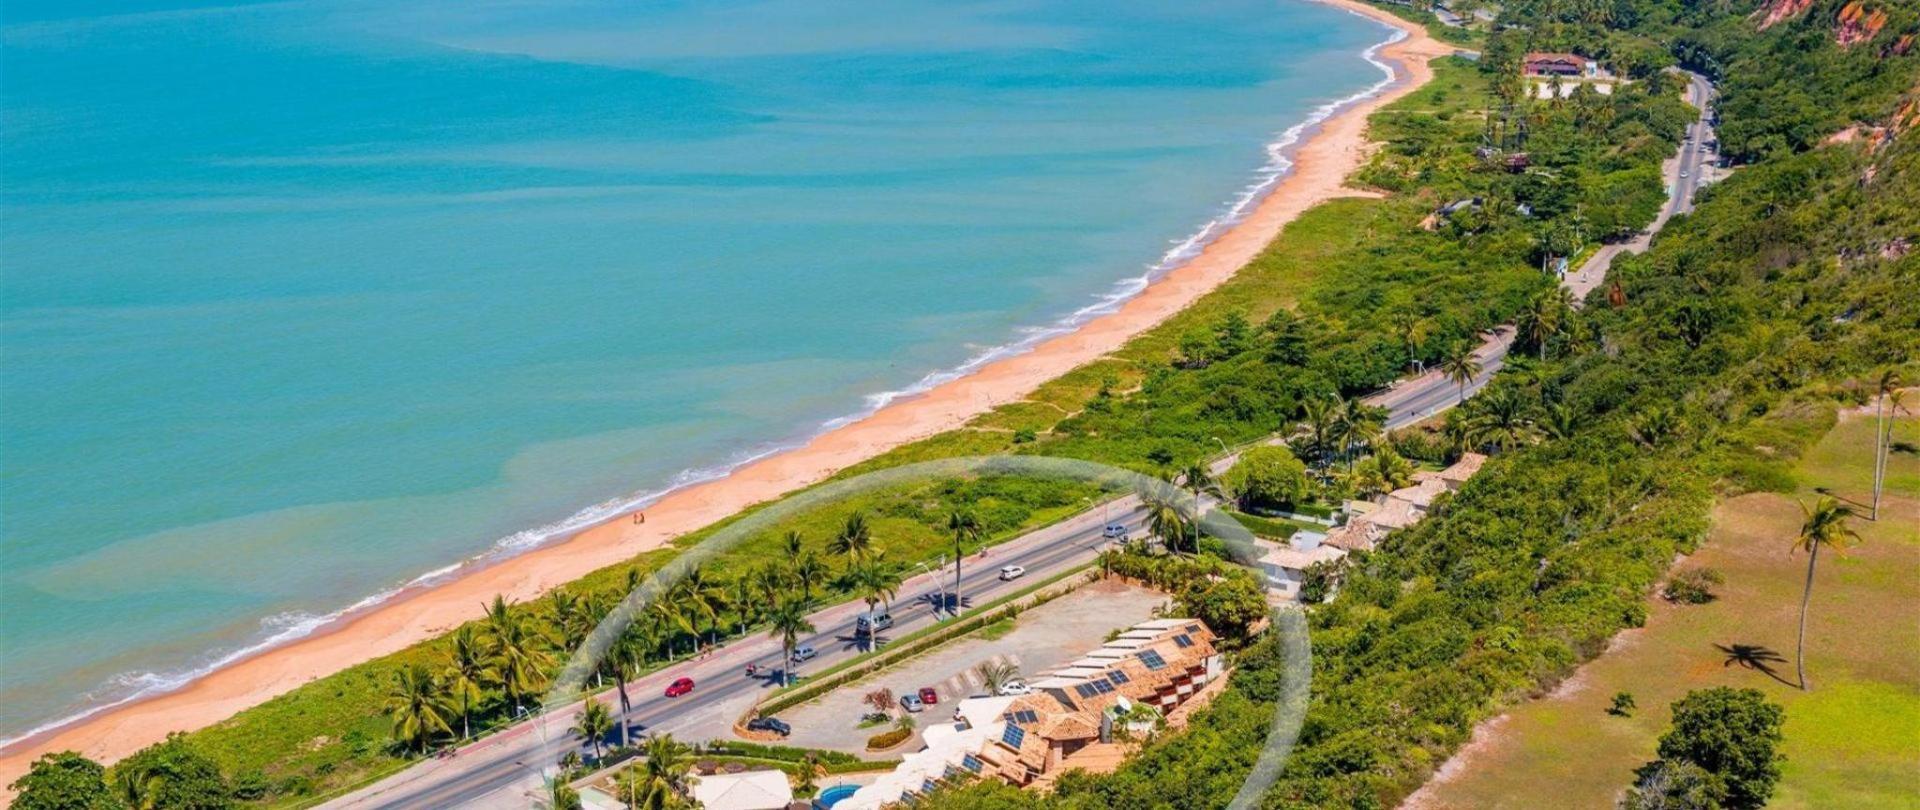 Quinta do Sol Hotel_Porto Seguro_Bahia (3).jpg